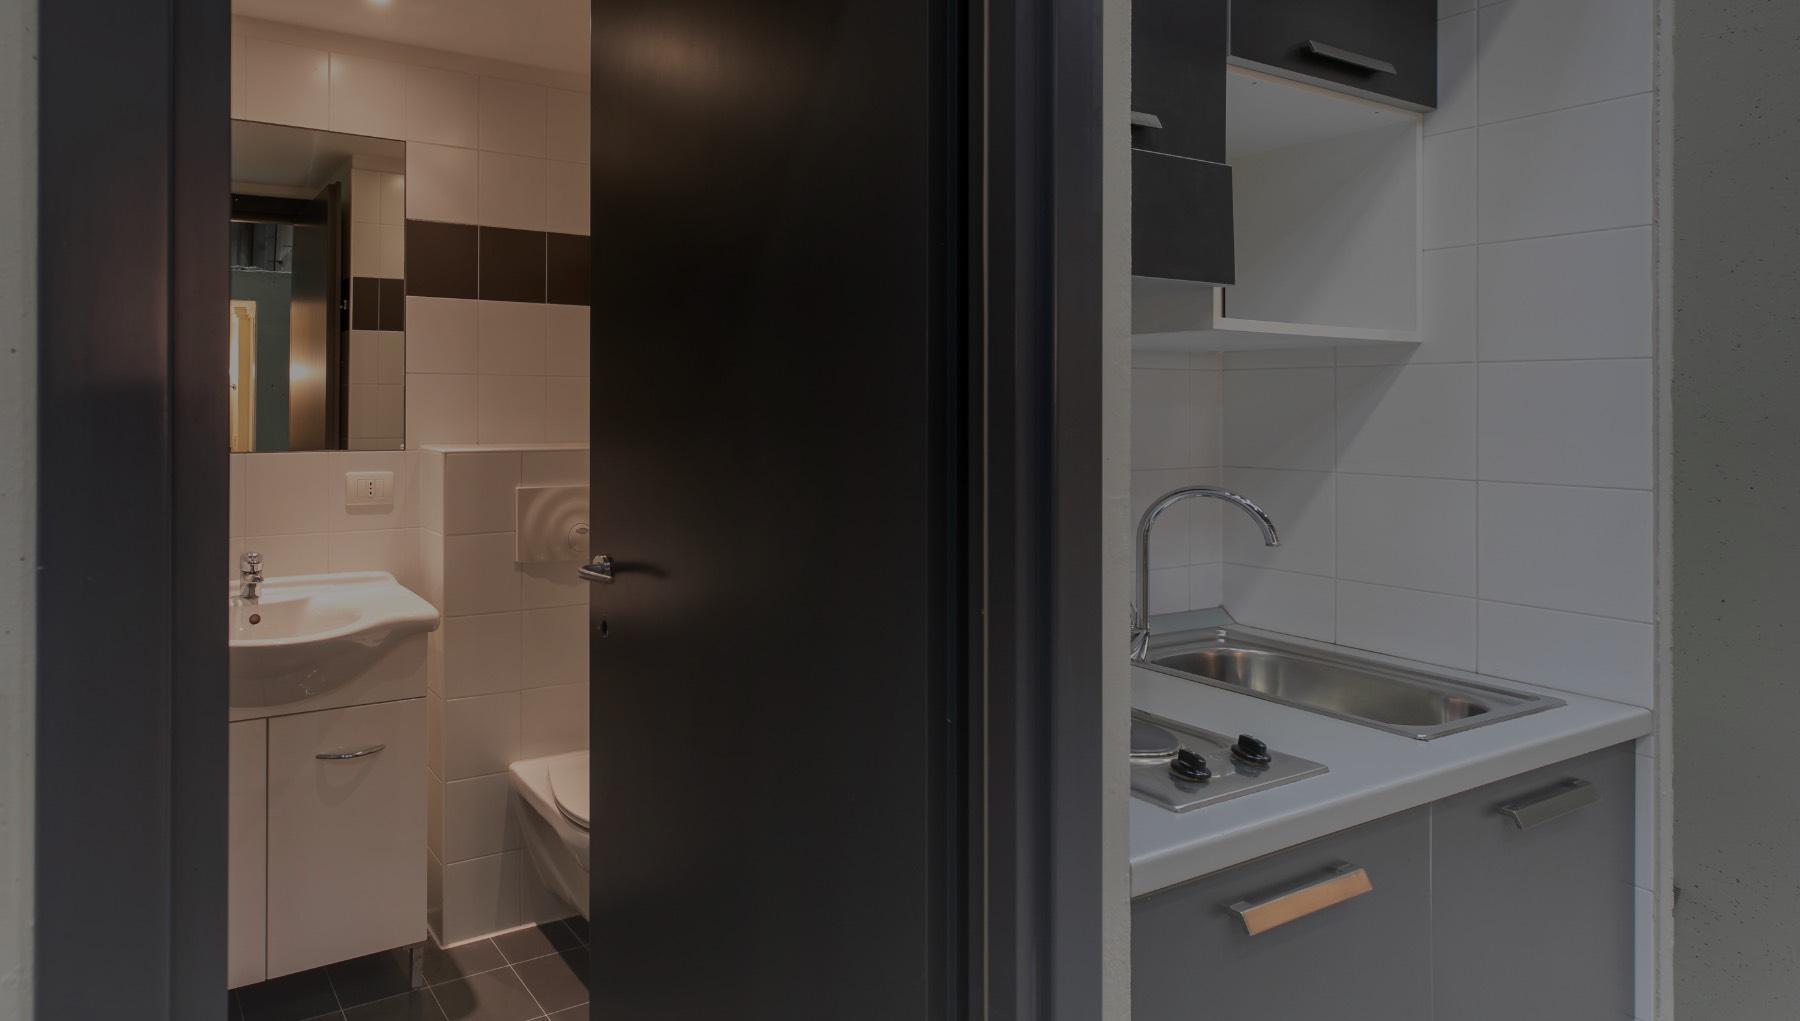 COMBI bathroom-kitchen modular pods